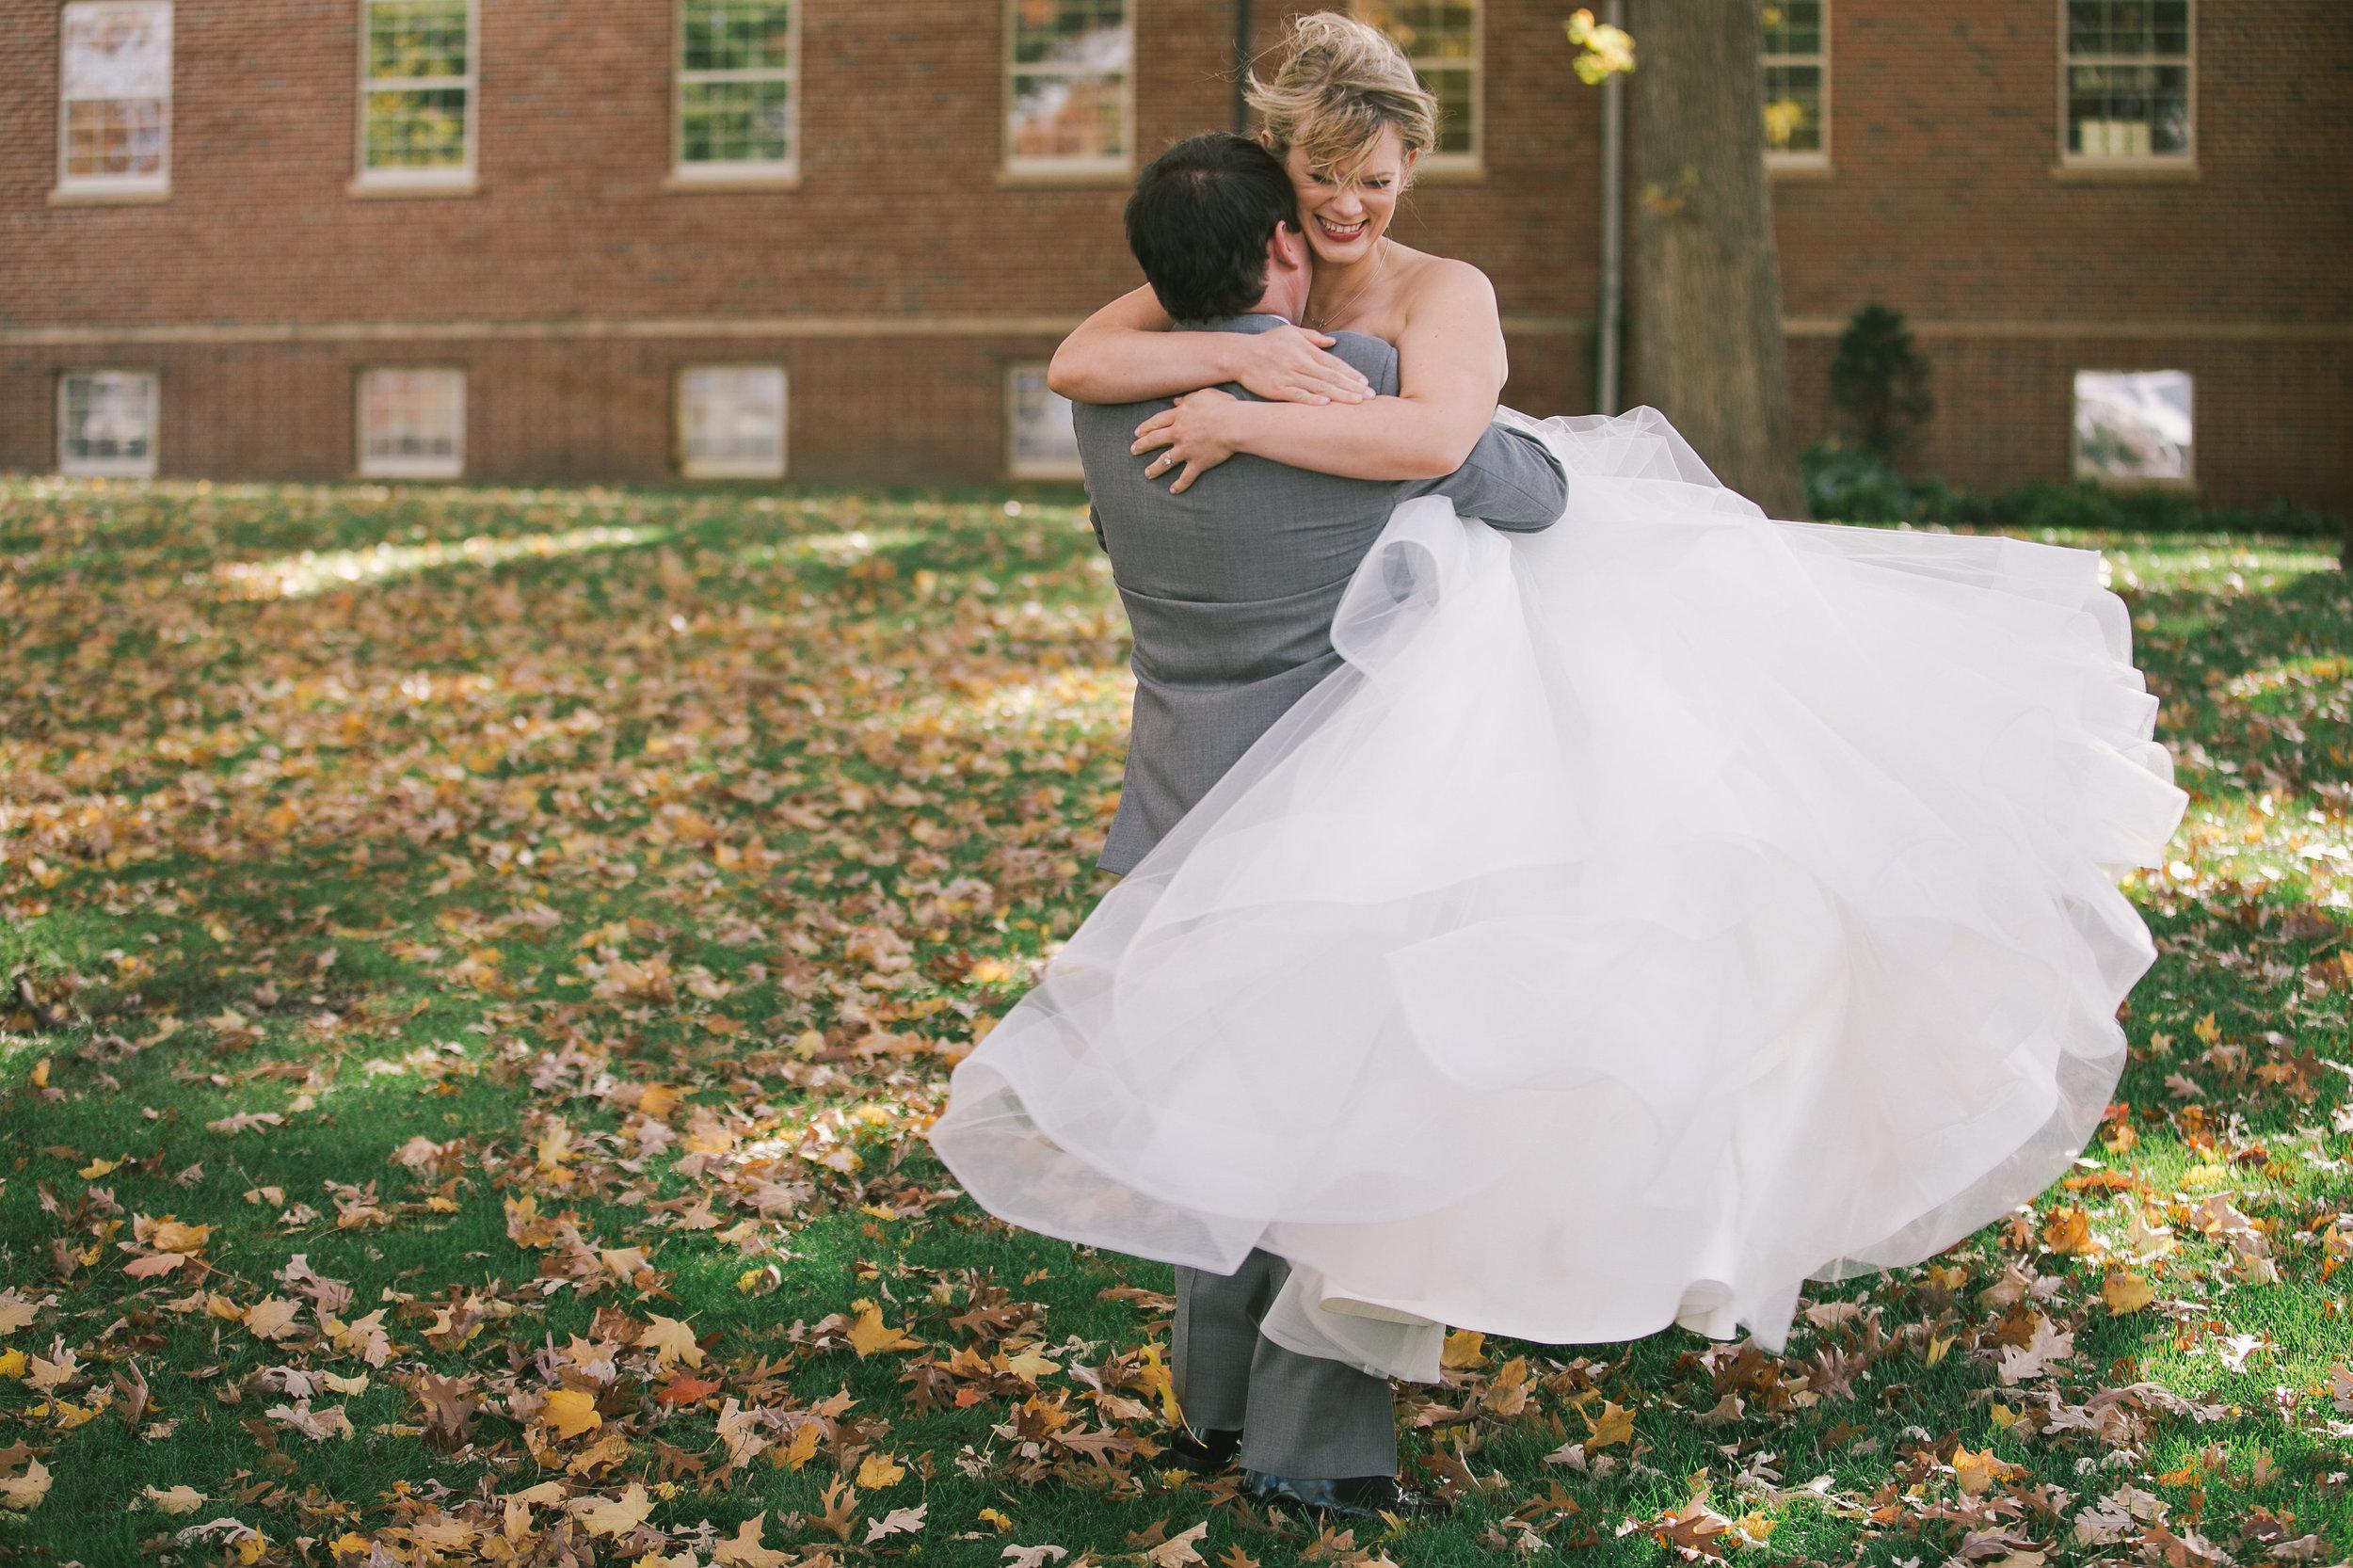 kim-nate-wedding-180 - Copy.jpg